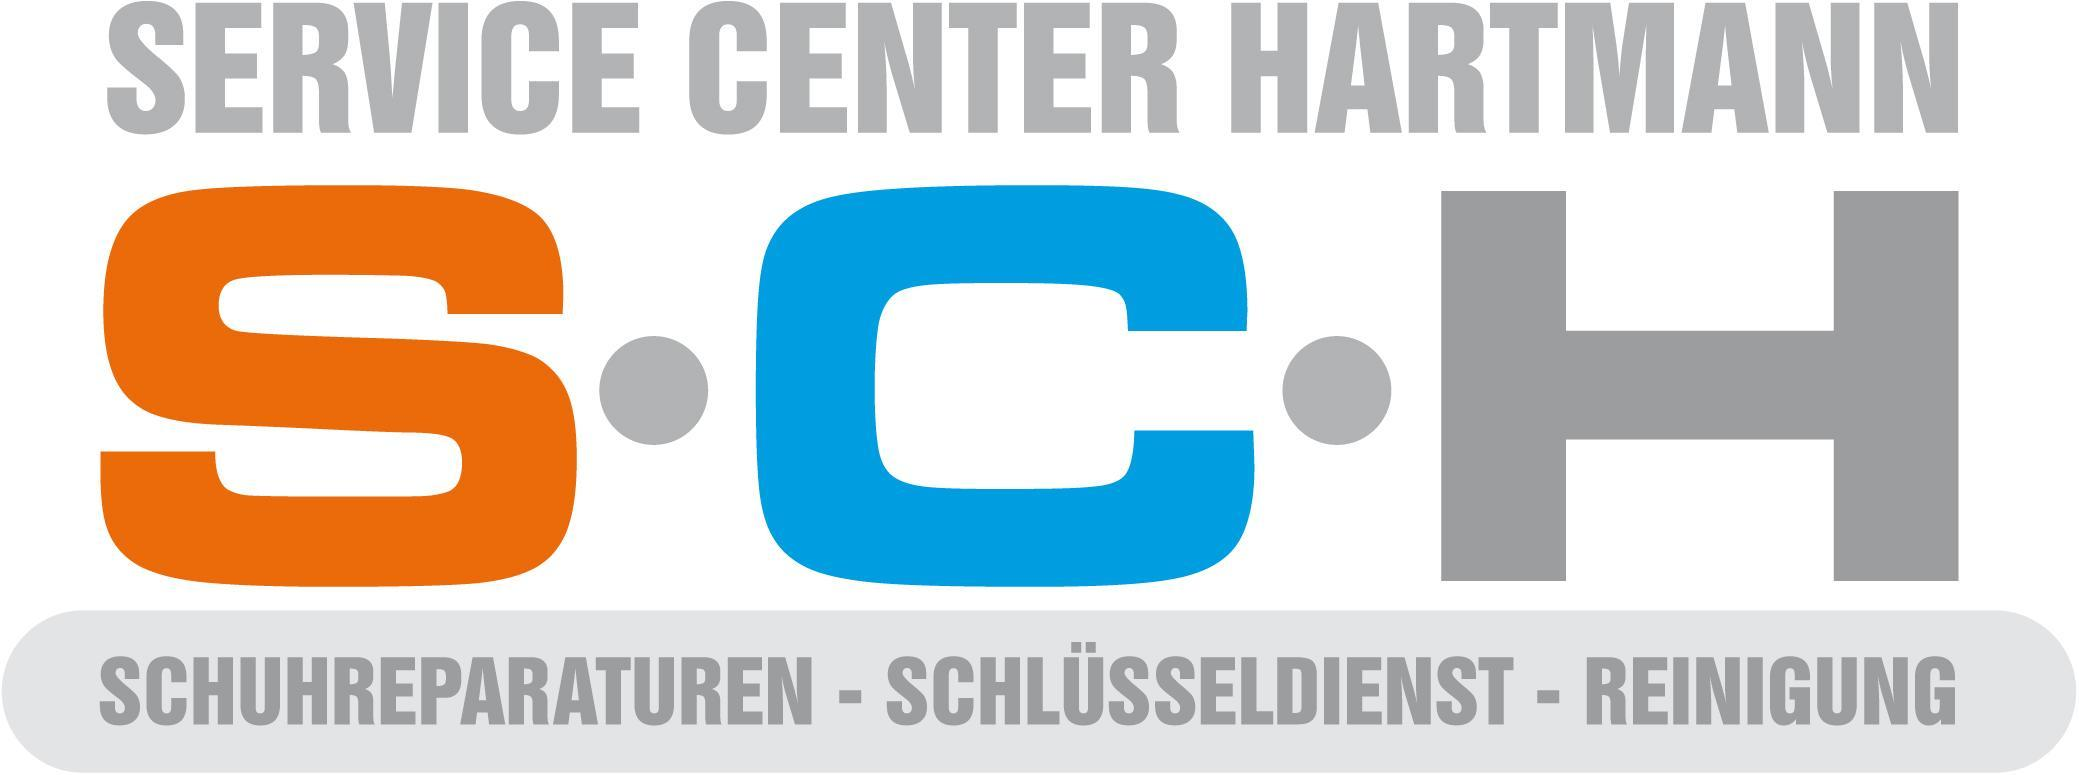 Logo Service Center Hartmann